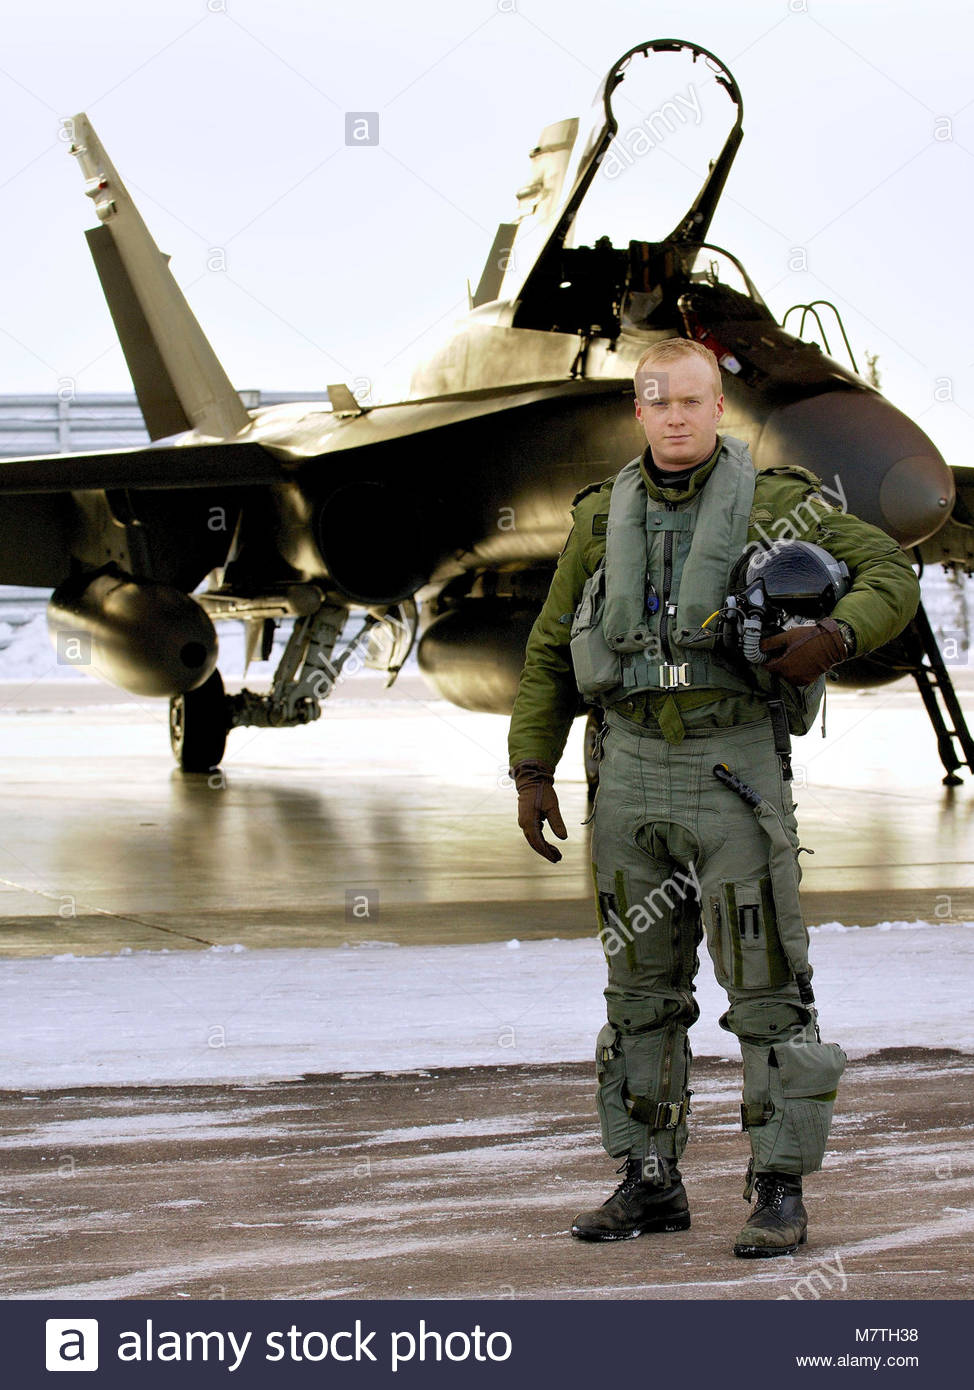 Le Capitaine Yuri Mokievsky-Zubok. Le pilote d'un CF-18 Hornet, le Capitaine Yuri ''EDLO Mokievsky-Zubok'' Photo Stock